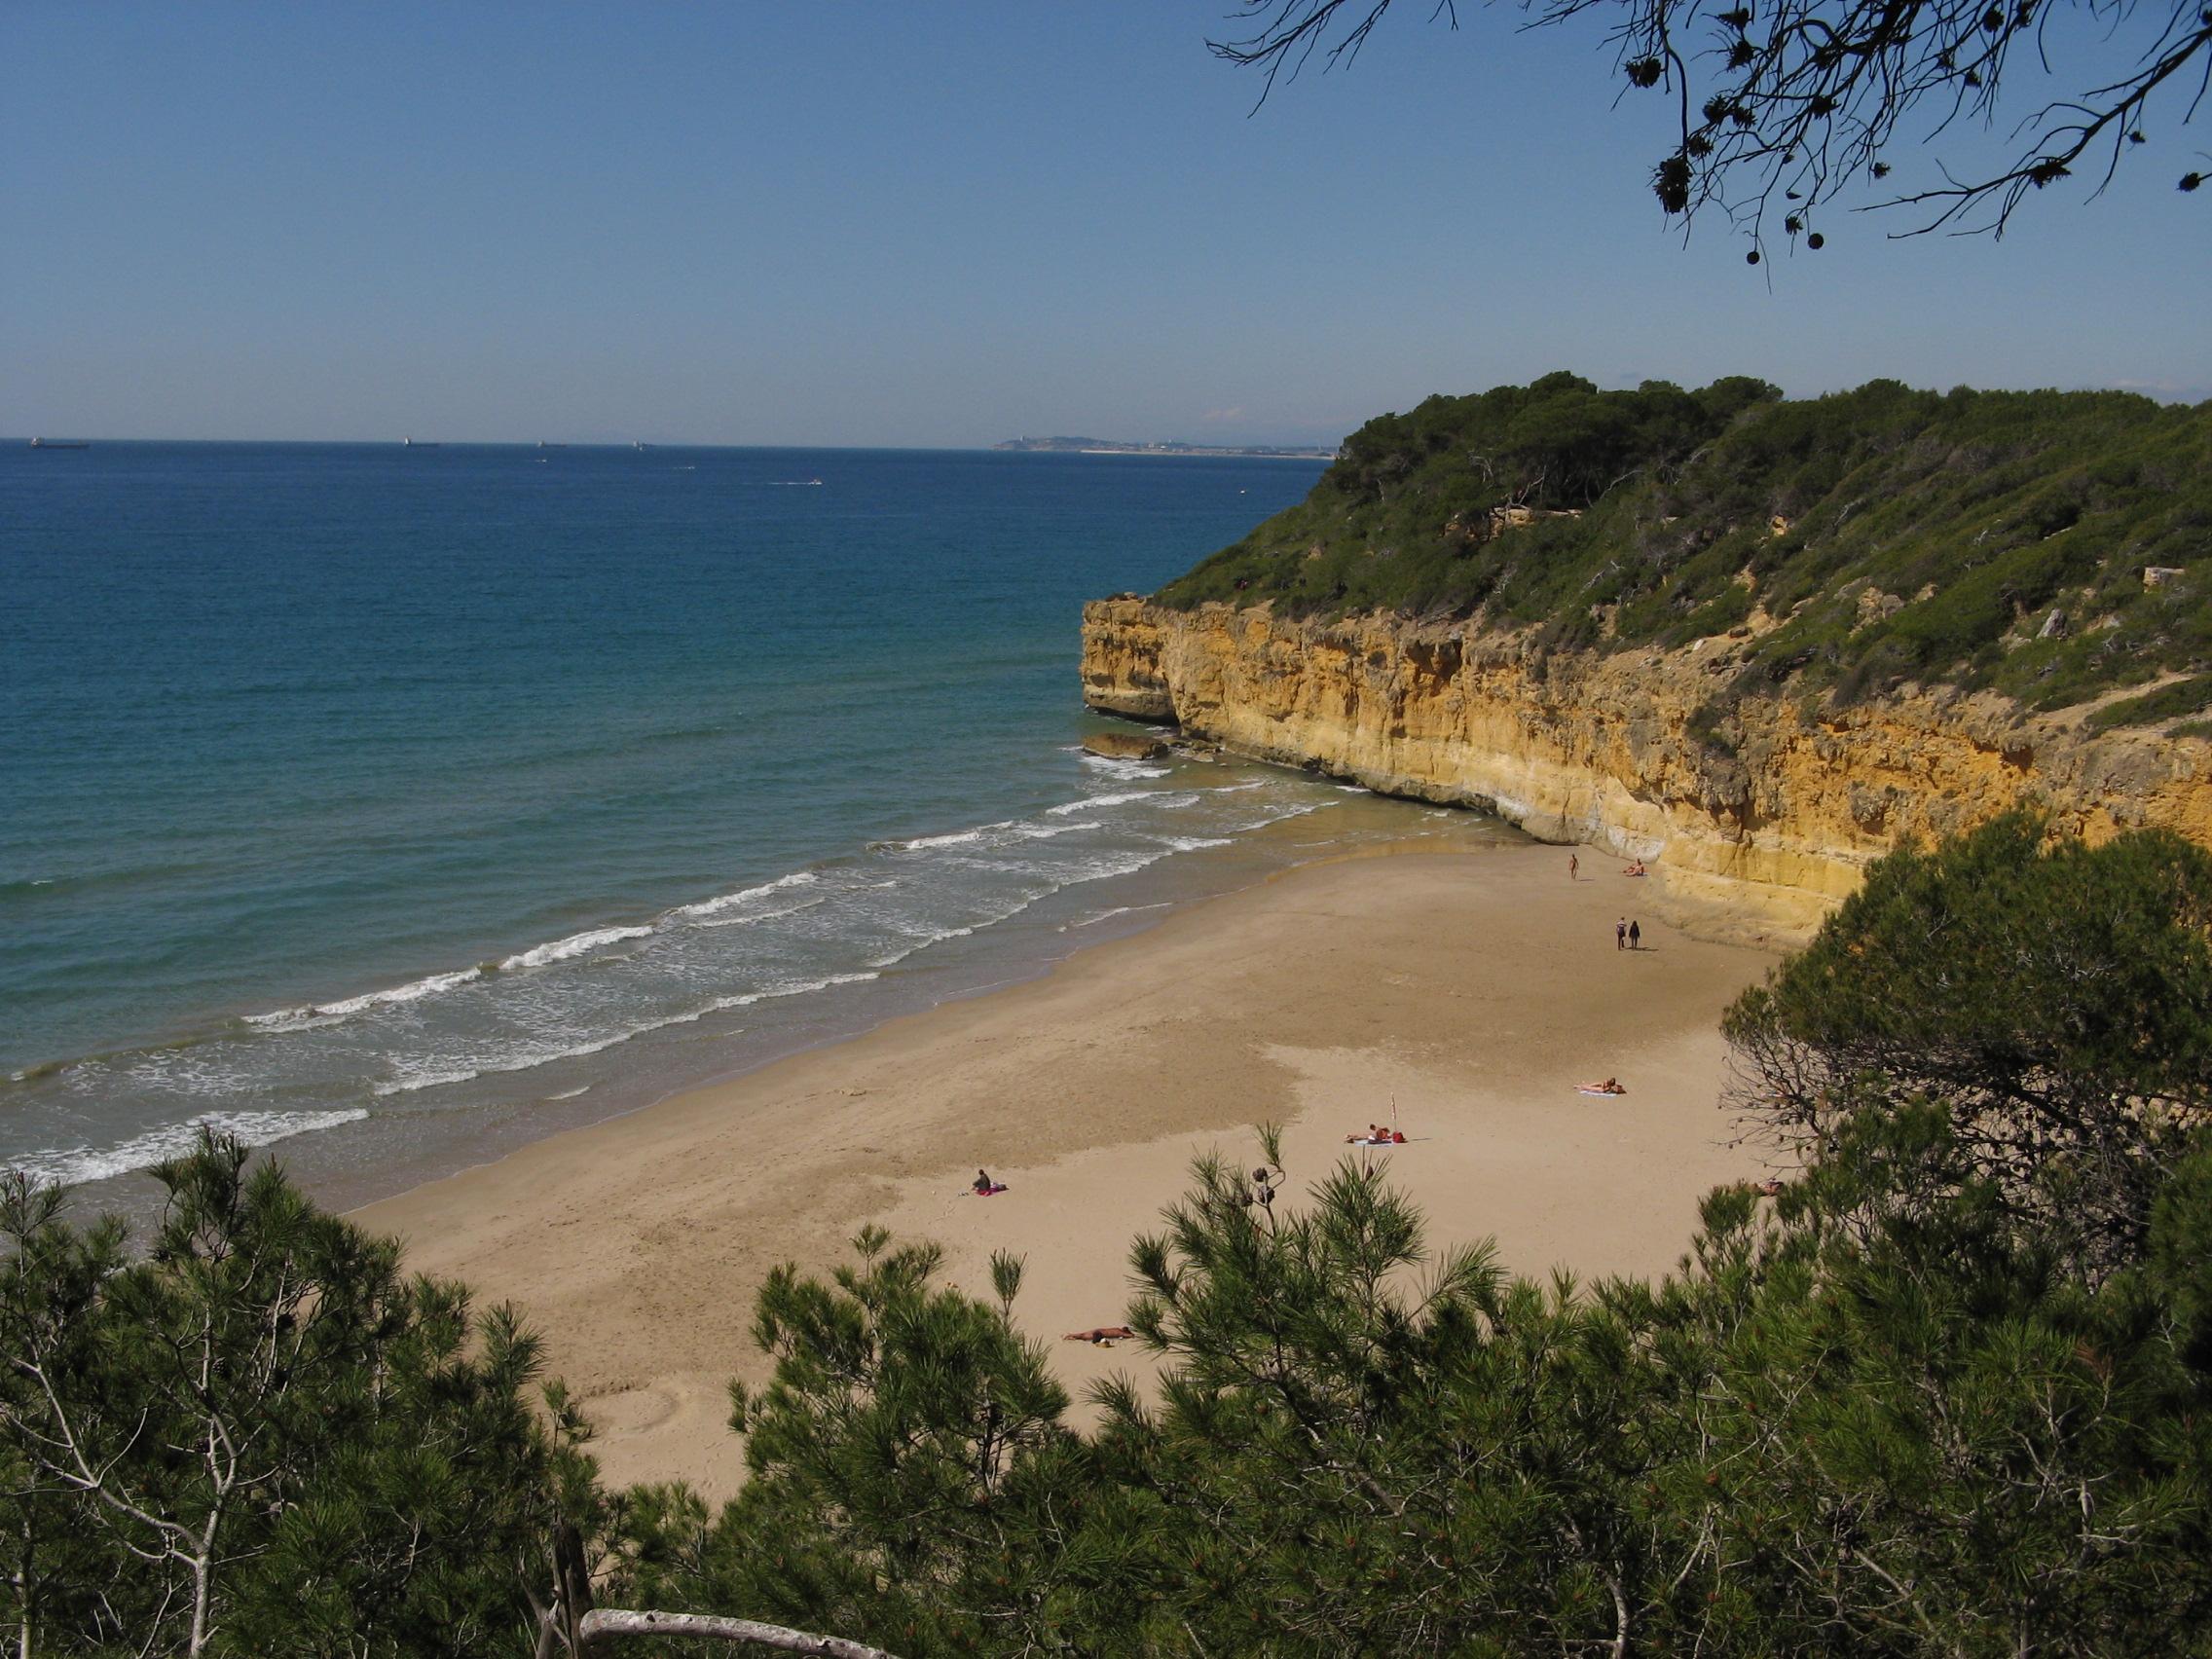 Playa Cala Botella